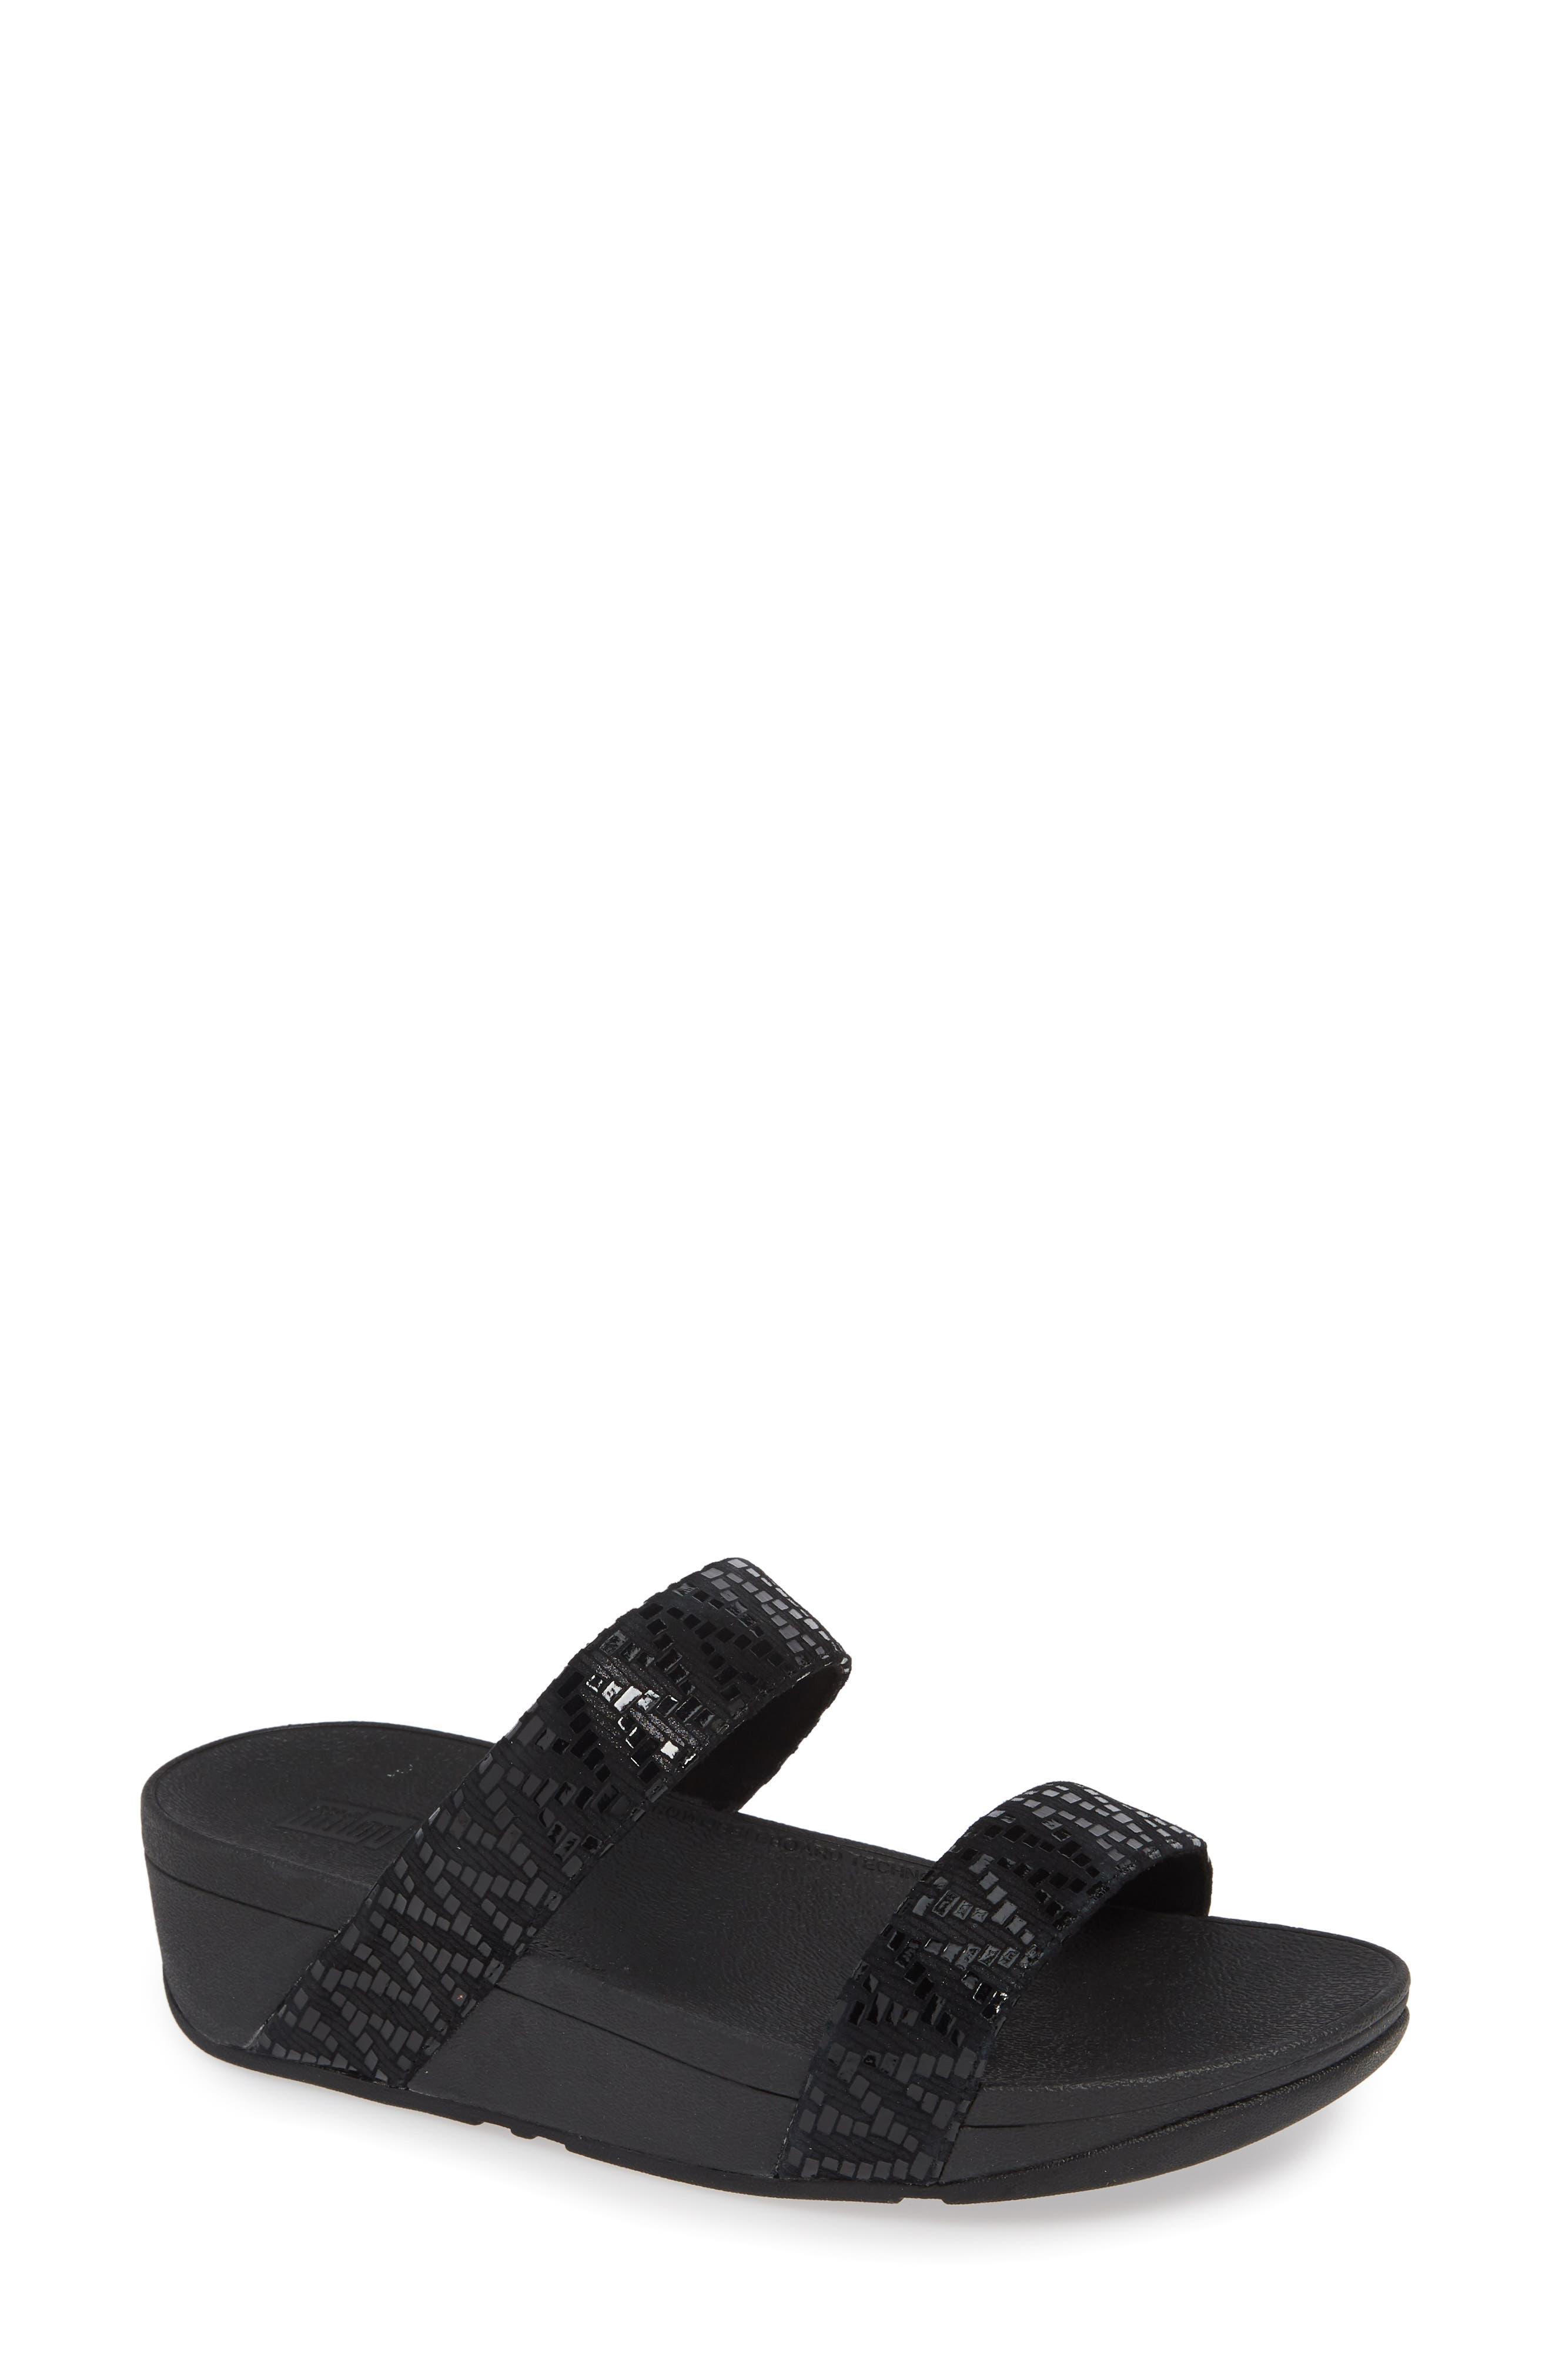 FITFLOP Lottie Chevron Wedge Slide Sandal, Main, color, BLACK FABRIC